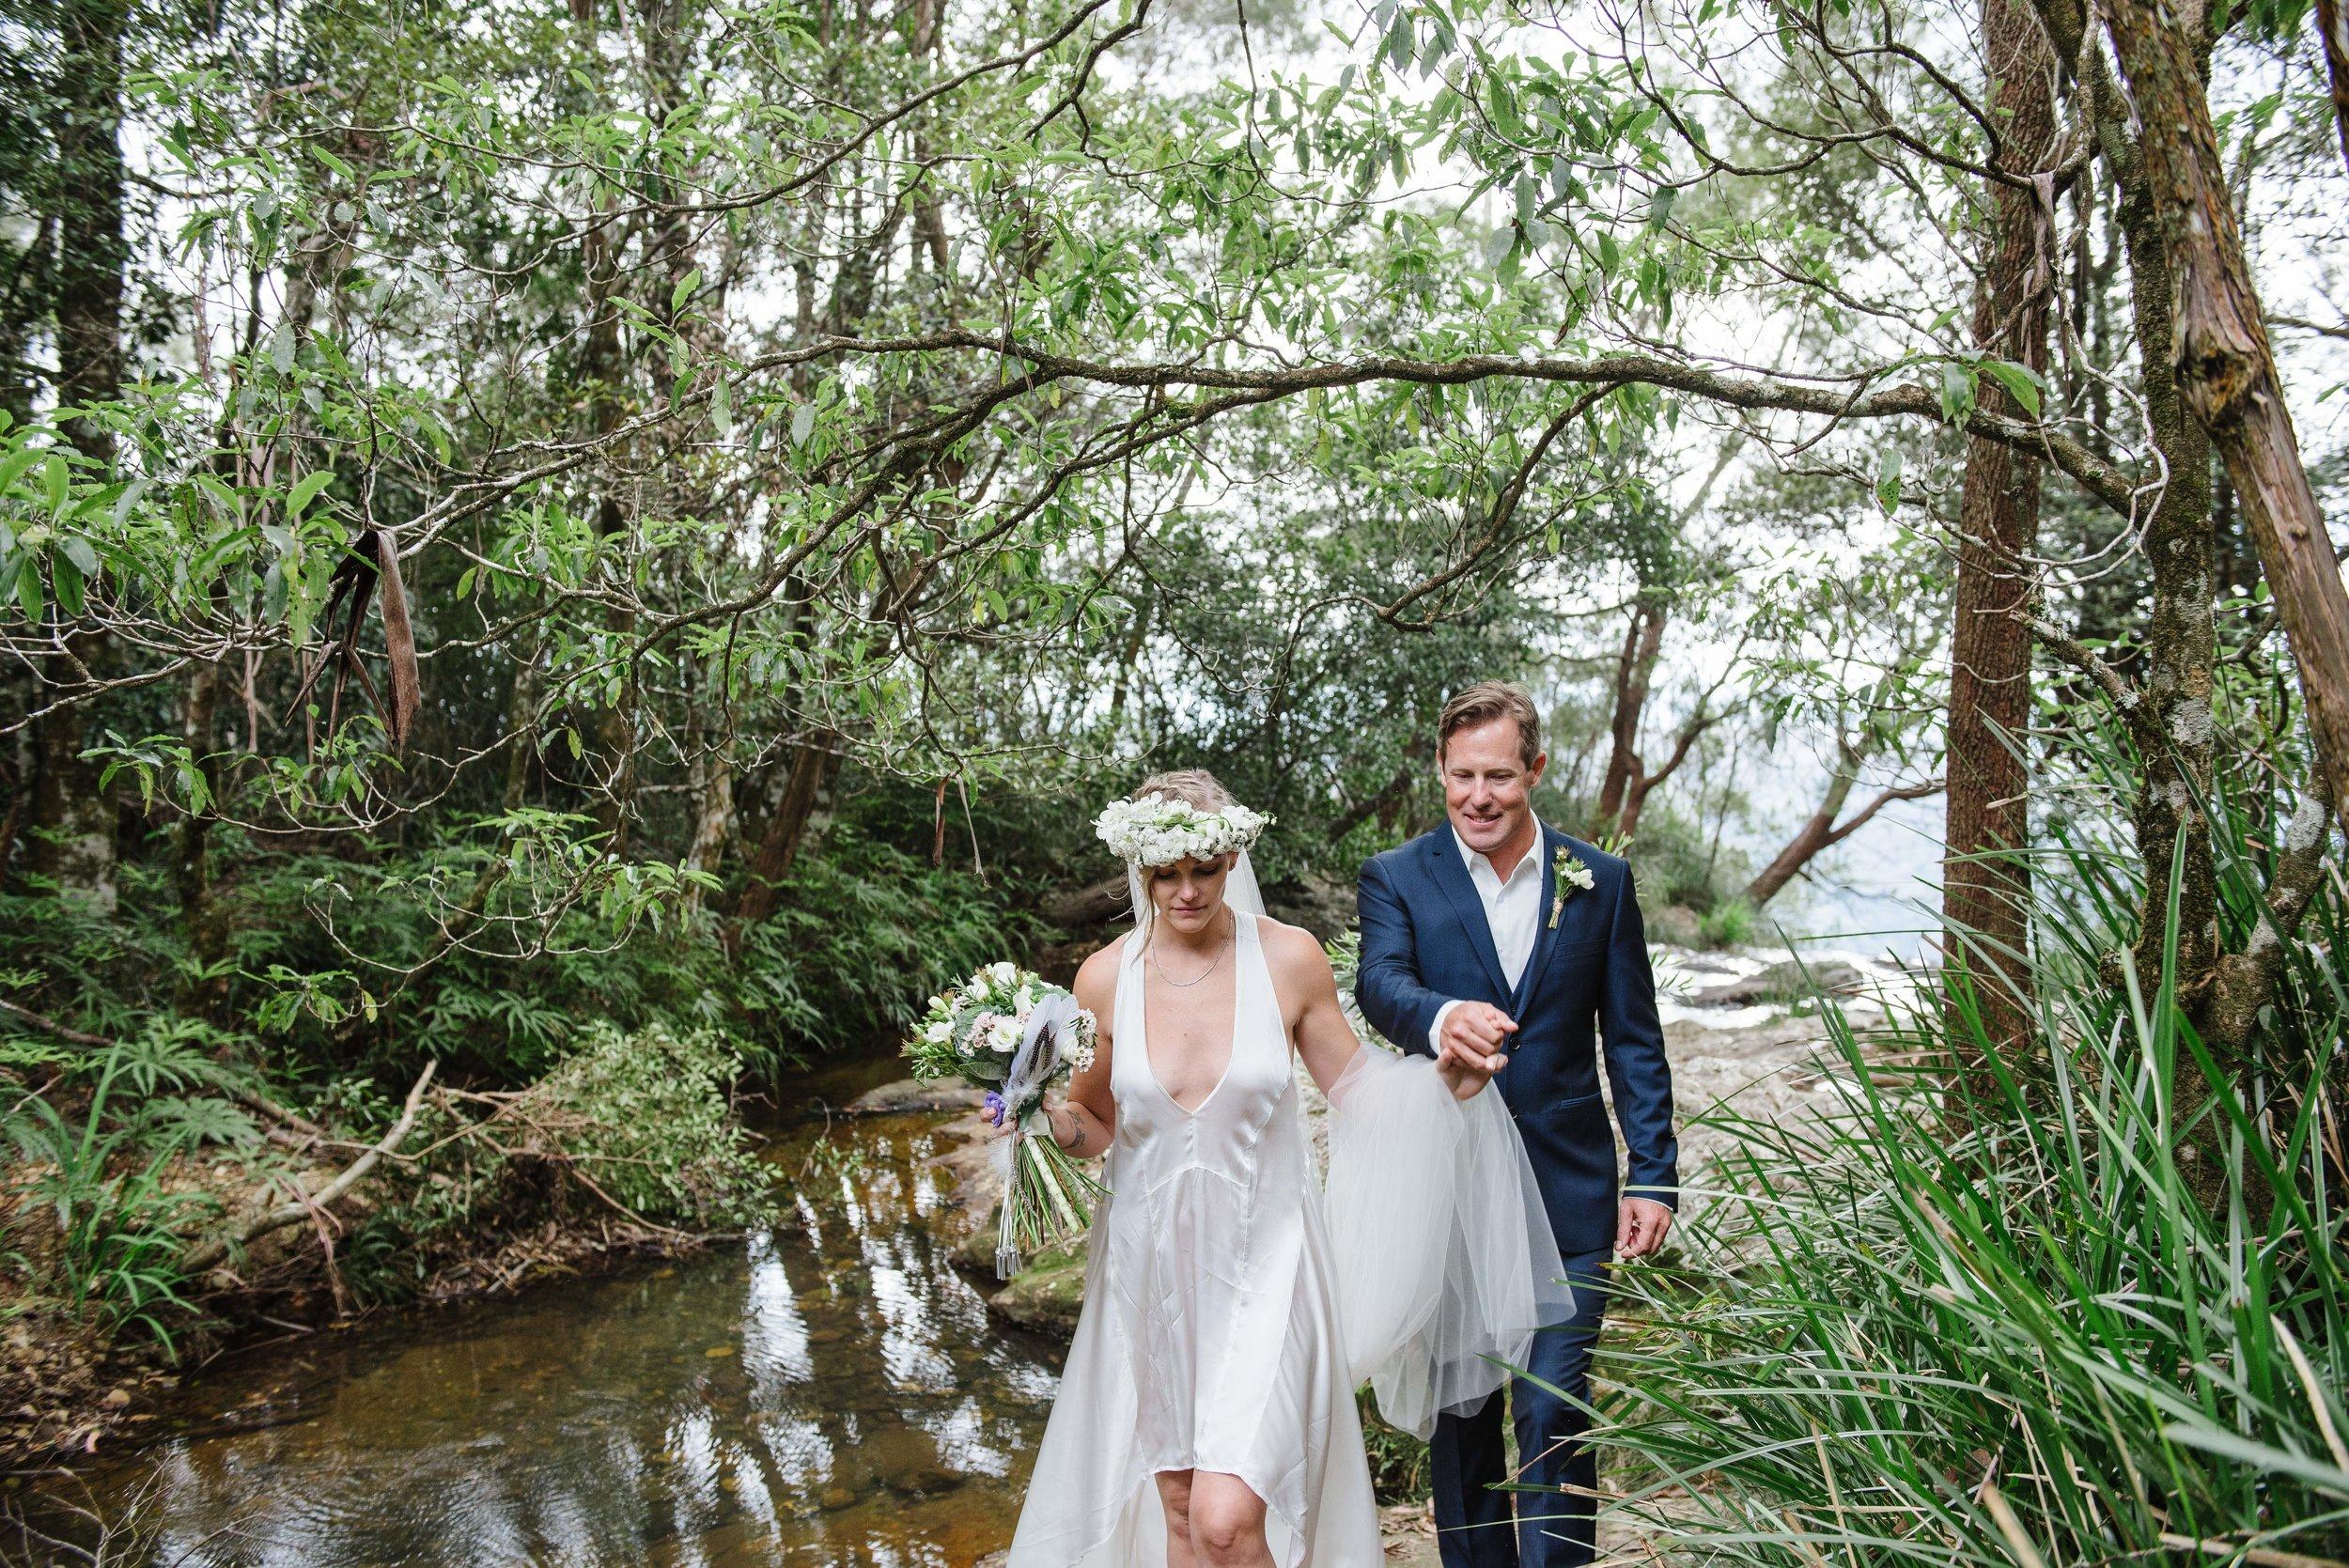 Carla and Luke- wedding photographer, byron bay wedding and family photographer, tweed heads wedding and family photography-316.jpg